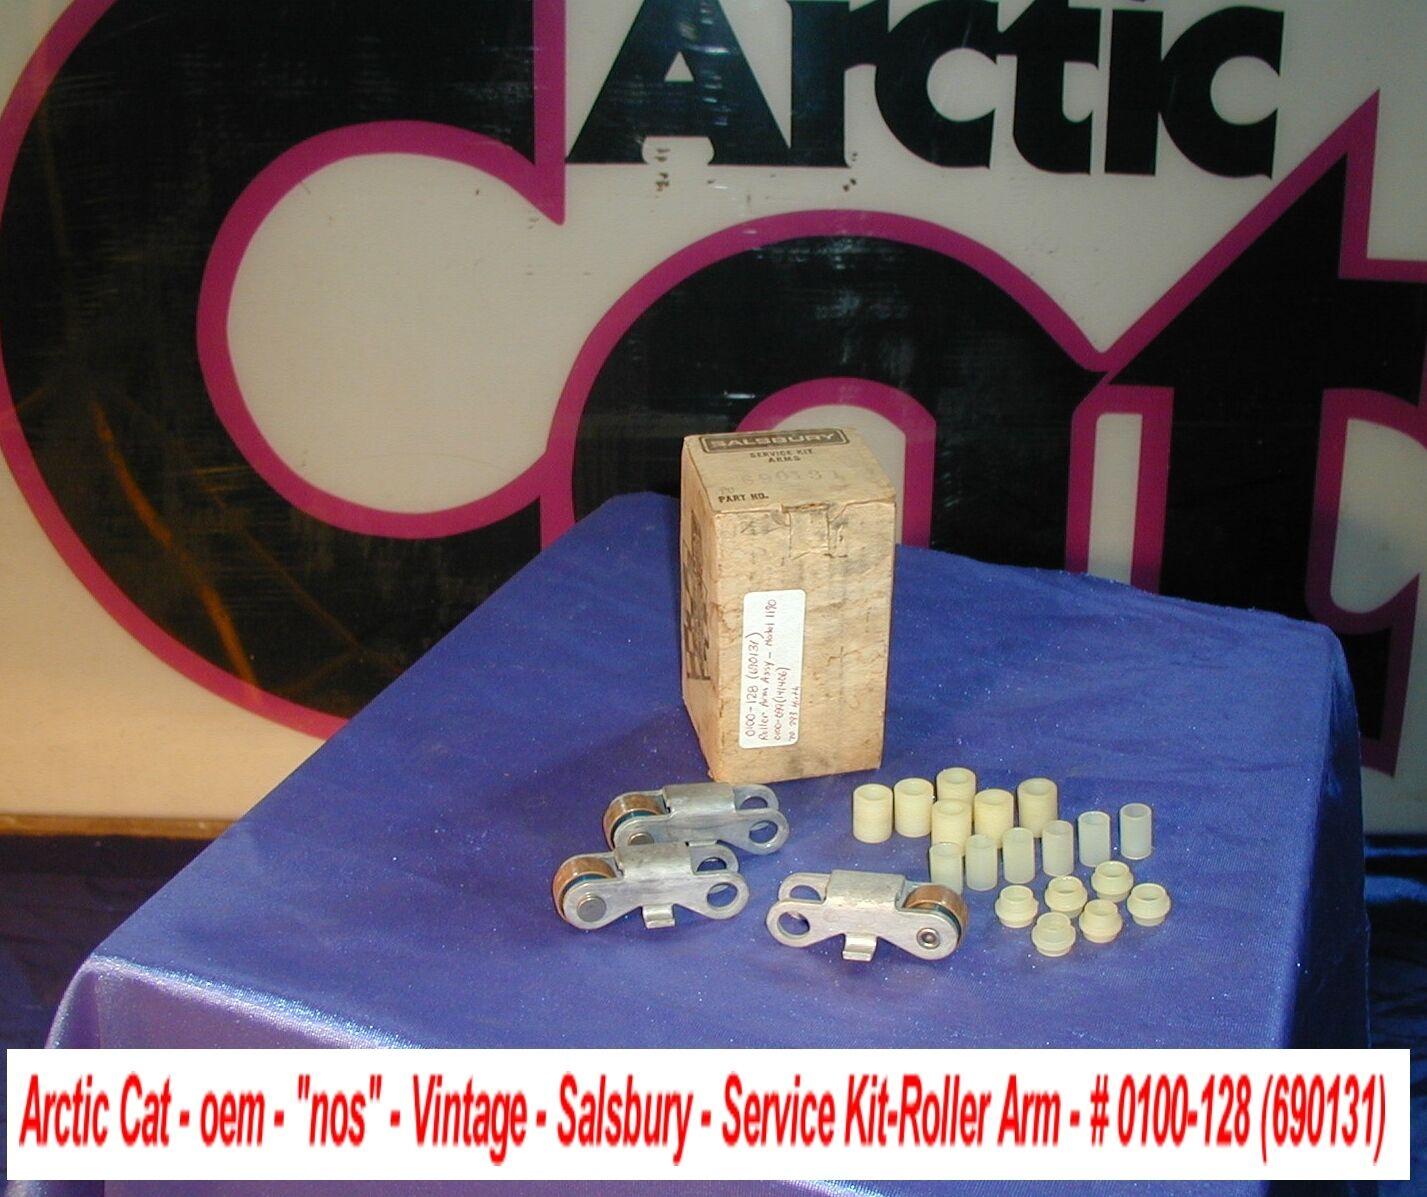 Arctic Cat Salsbury Service Kit (690131) Roller Arm 1190